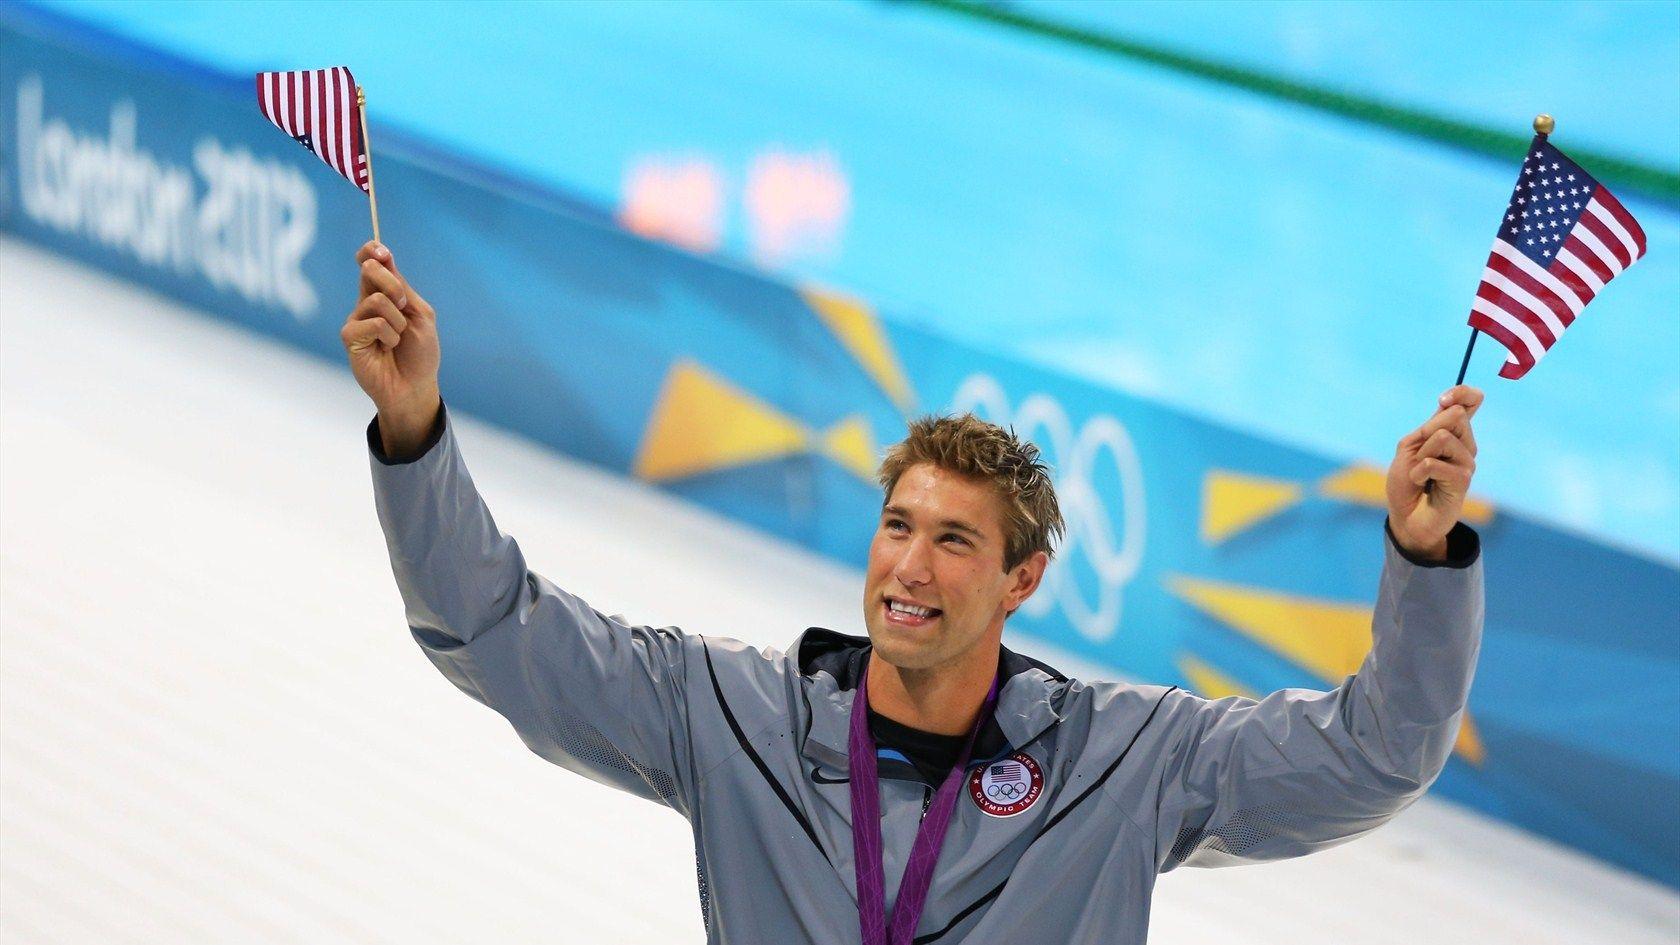 45 Best Photographs of 2012 London Olympic Athletes